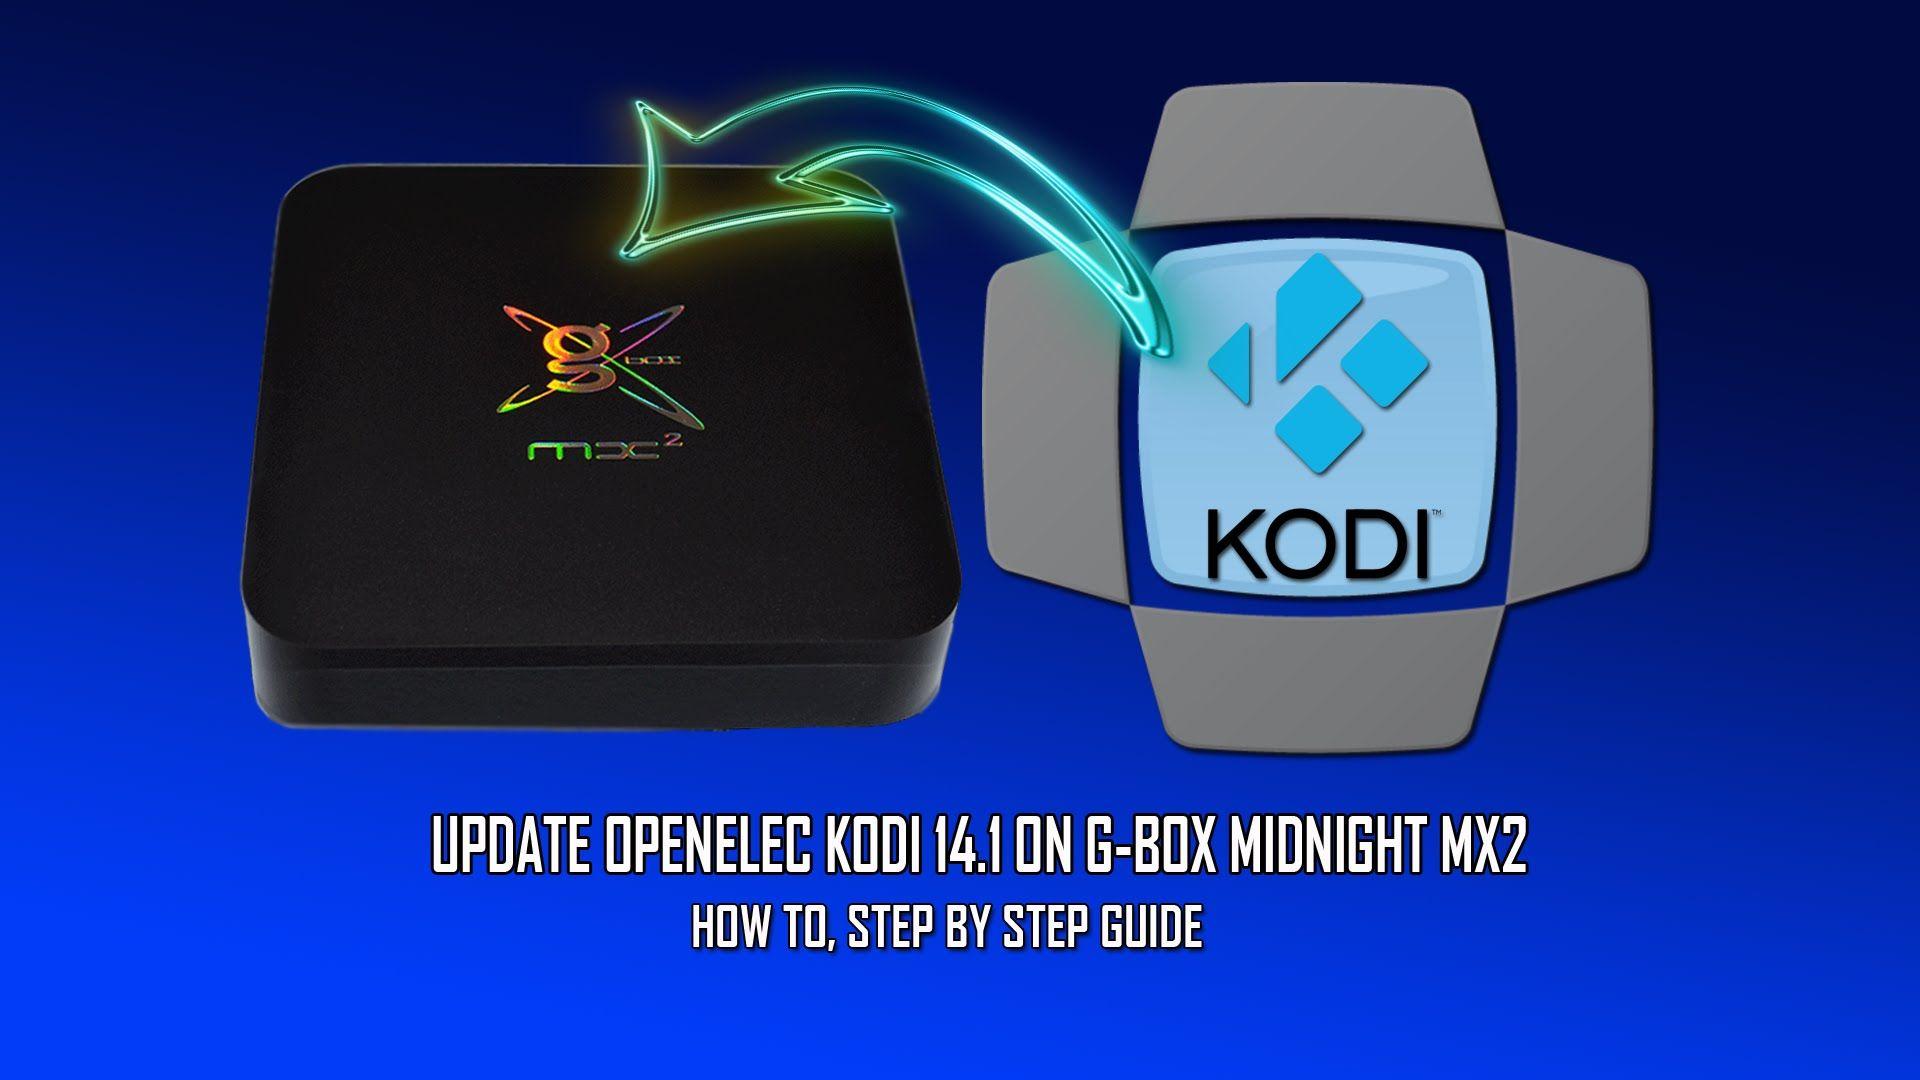 Update Openelec Kodi 141 On Gbox Midnight Mx2